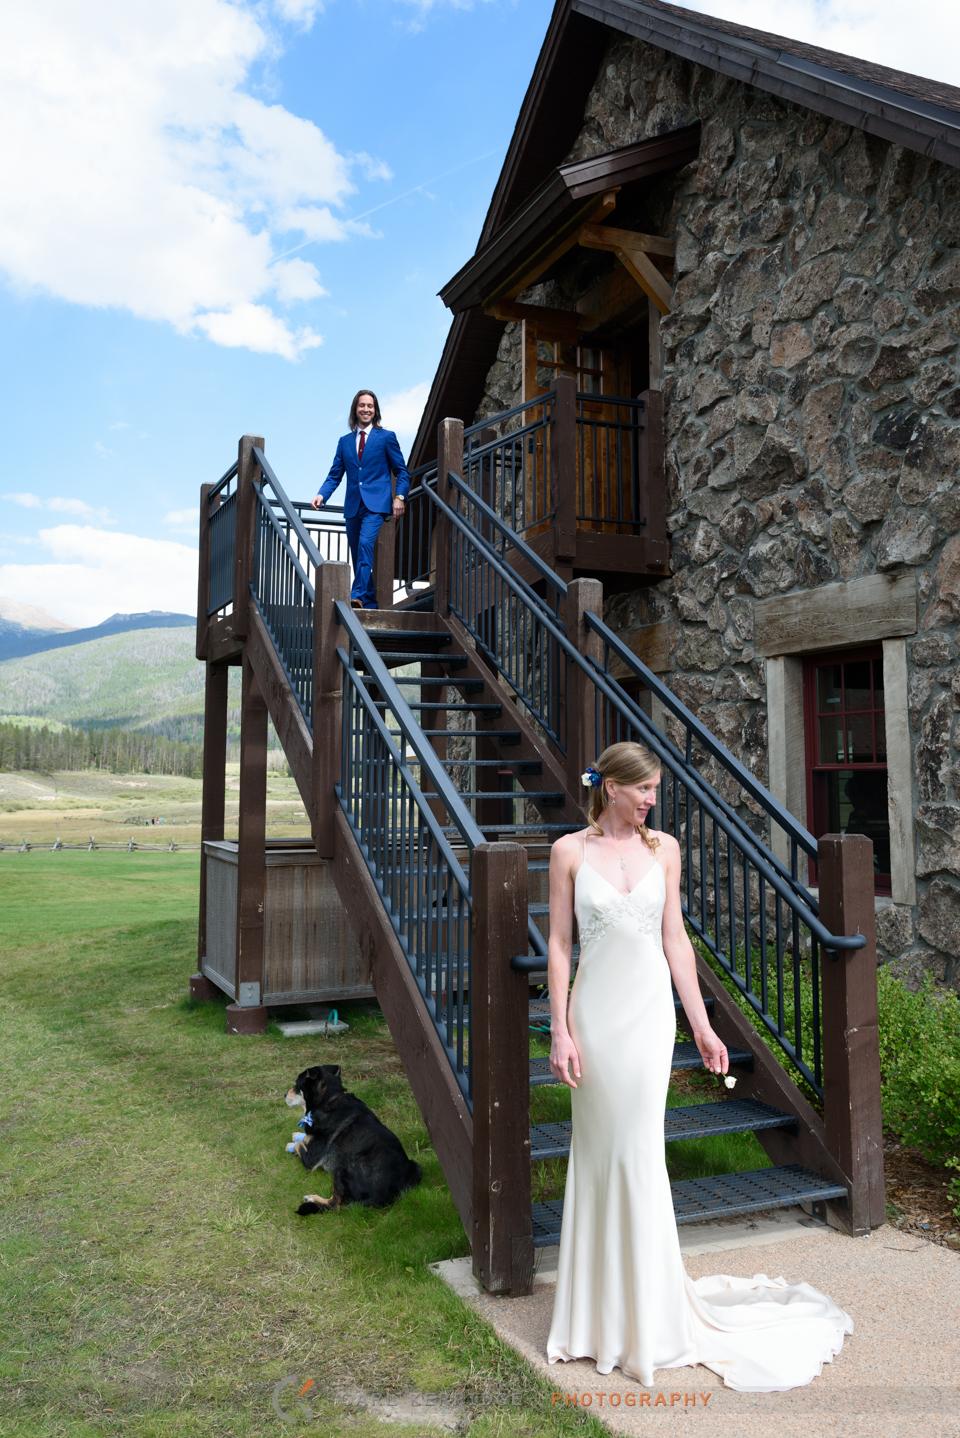 carl-kerridge-photography-wedding-devils-thumb-ranch-colorado-22